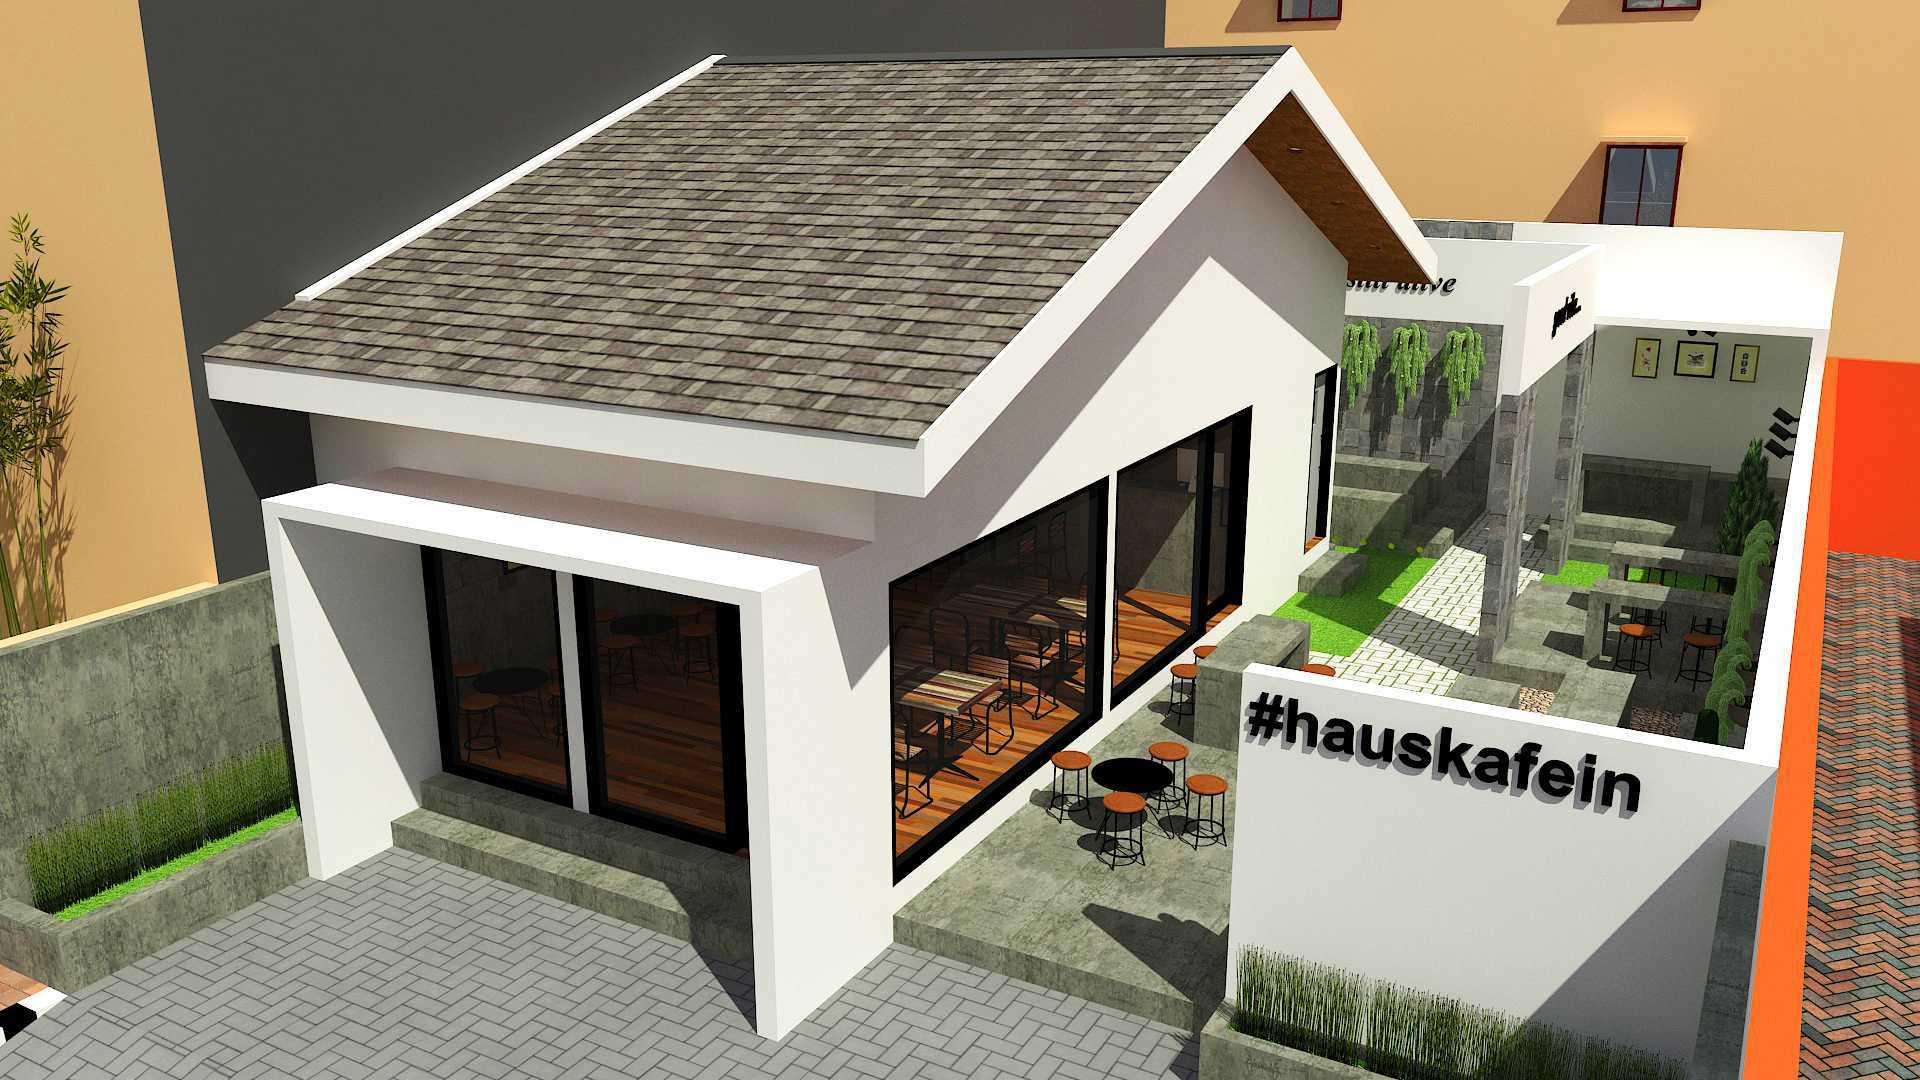 Ilham Gusti Syahadat #hauskafein Coffee Shop Kediri, Jawa Timur, Indonesia Kediri, Jawa Timur, Indonesia Exterior #hauskafein Coffee Shop Contemporary <P>Exterior #hauskafein Coffee Shop Youtube : Https://youtu.be/l7Gobbijd7E</p> 74369